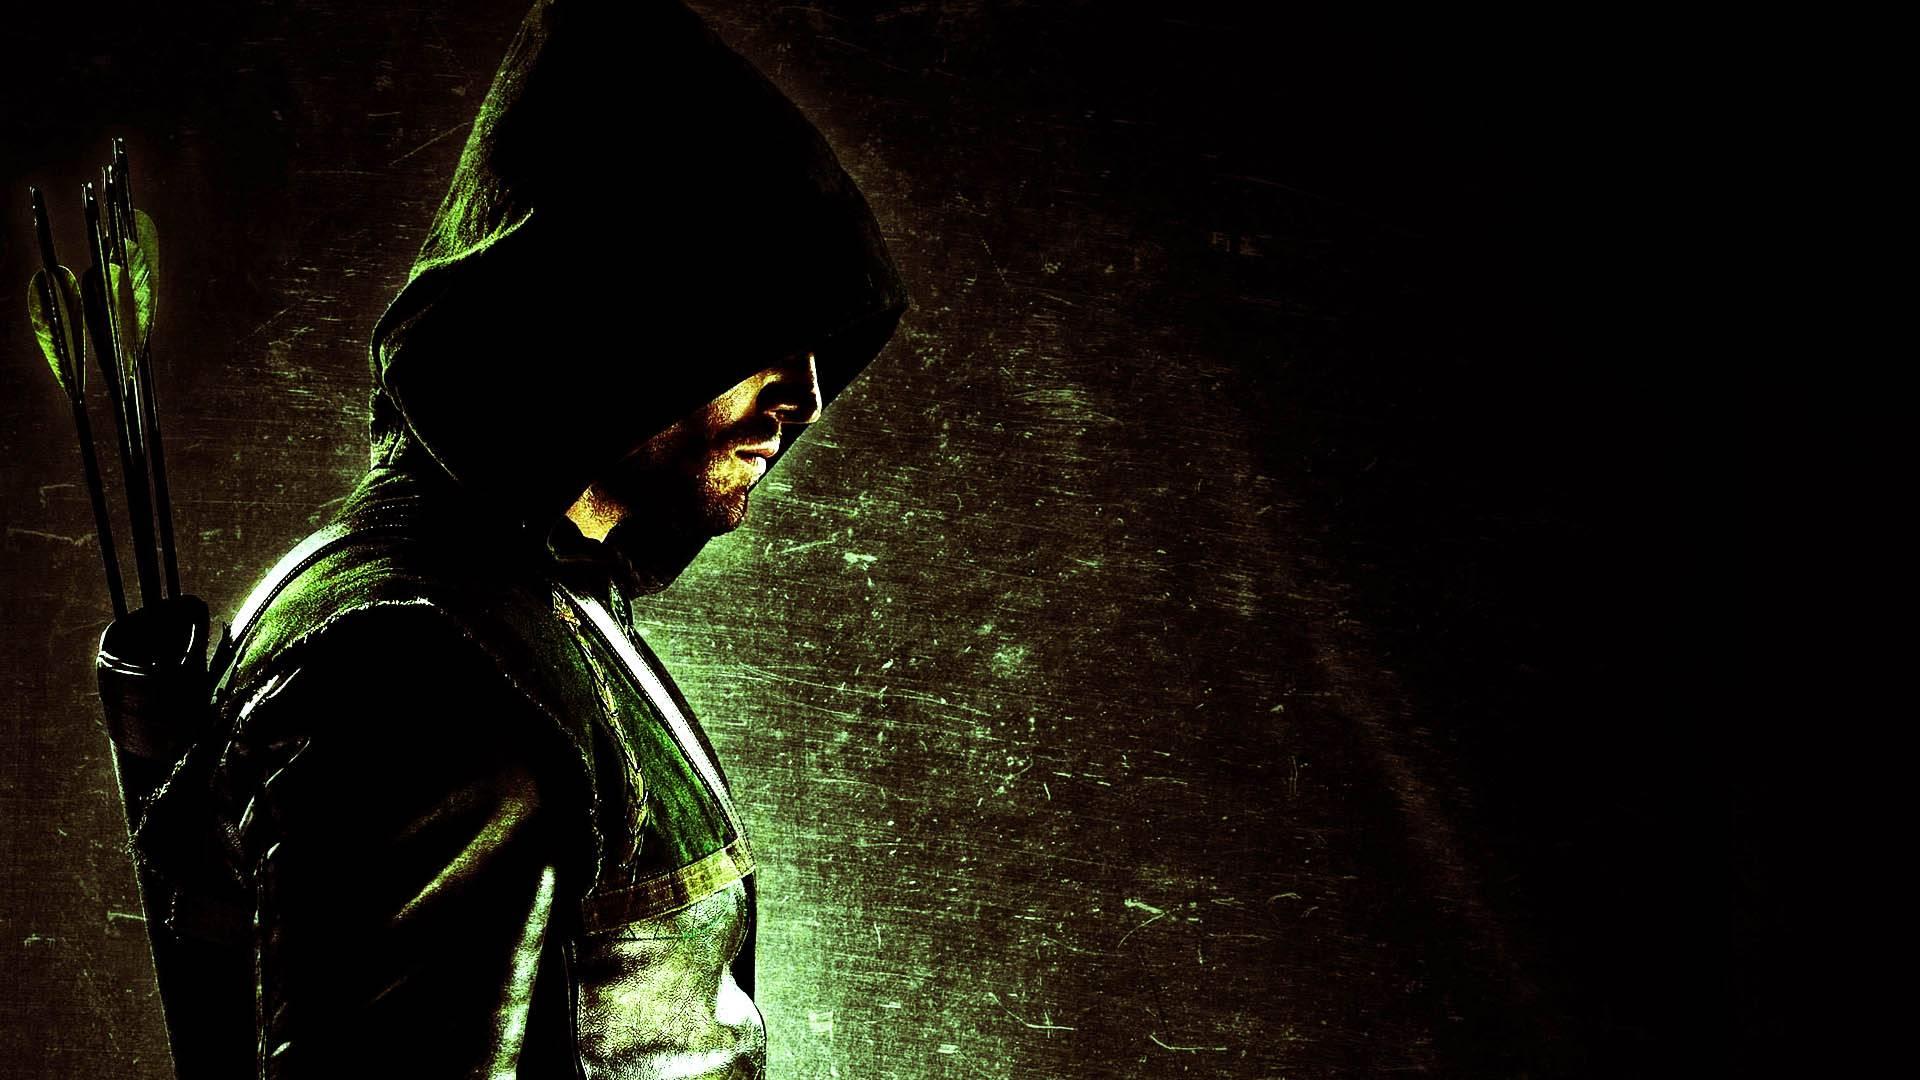 Black-Mask-Batman-and-Deathstroke-Batman-Arkham-Origins-wallpaper-wpc5802878